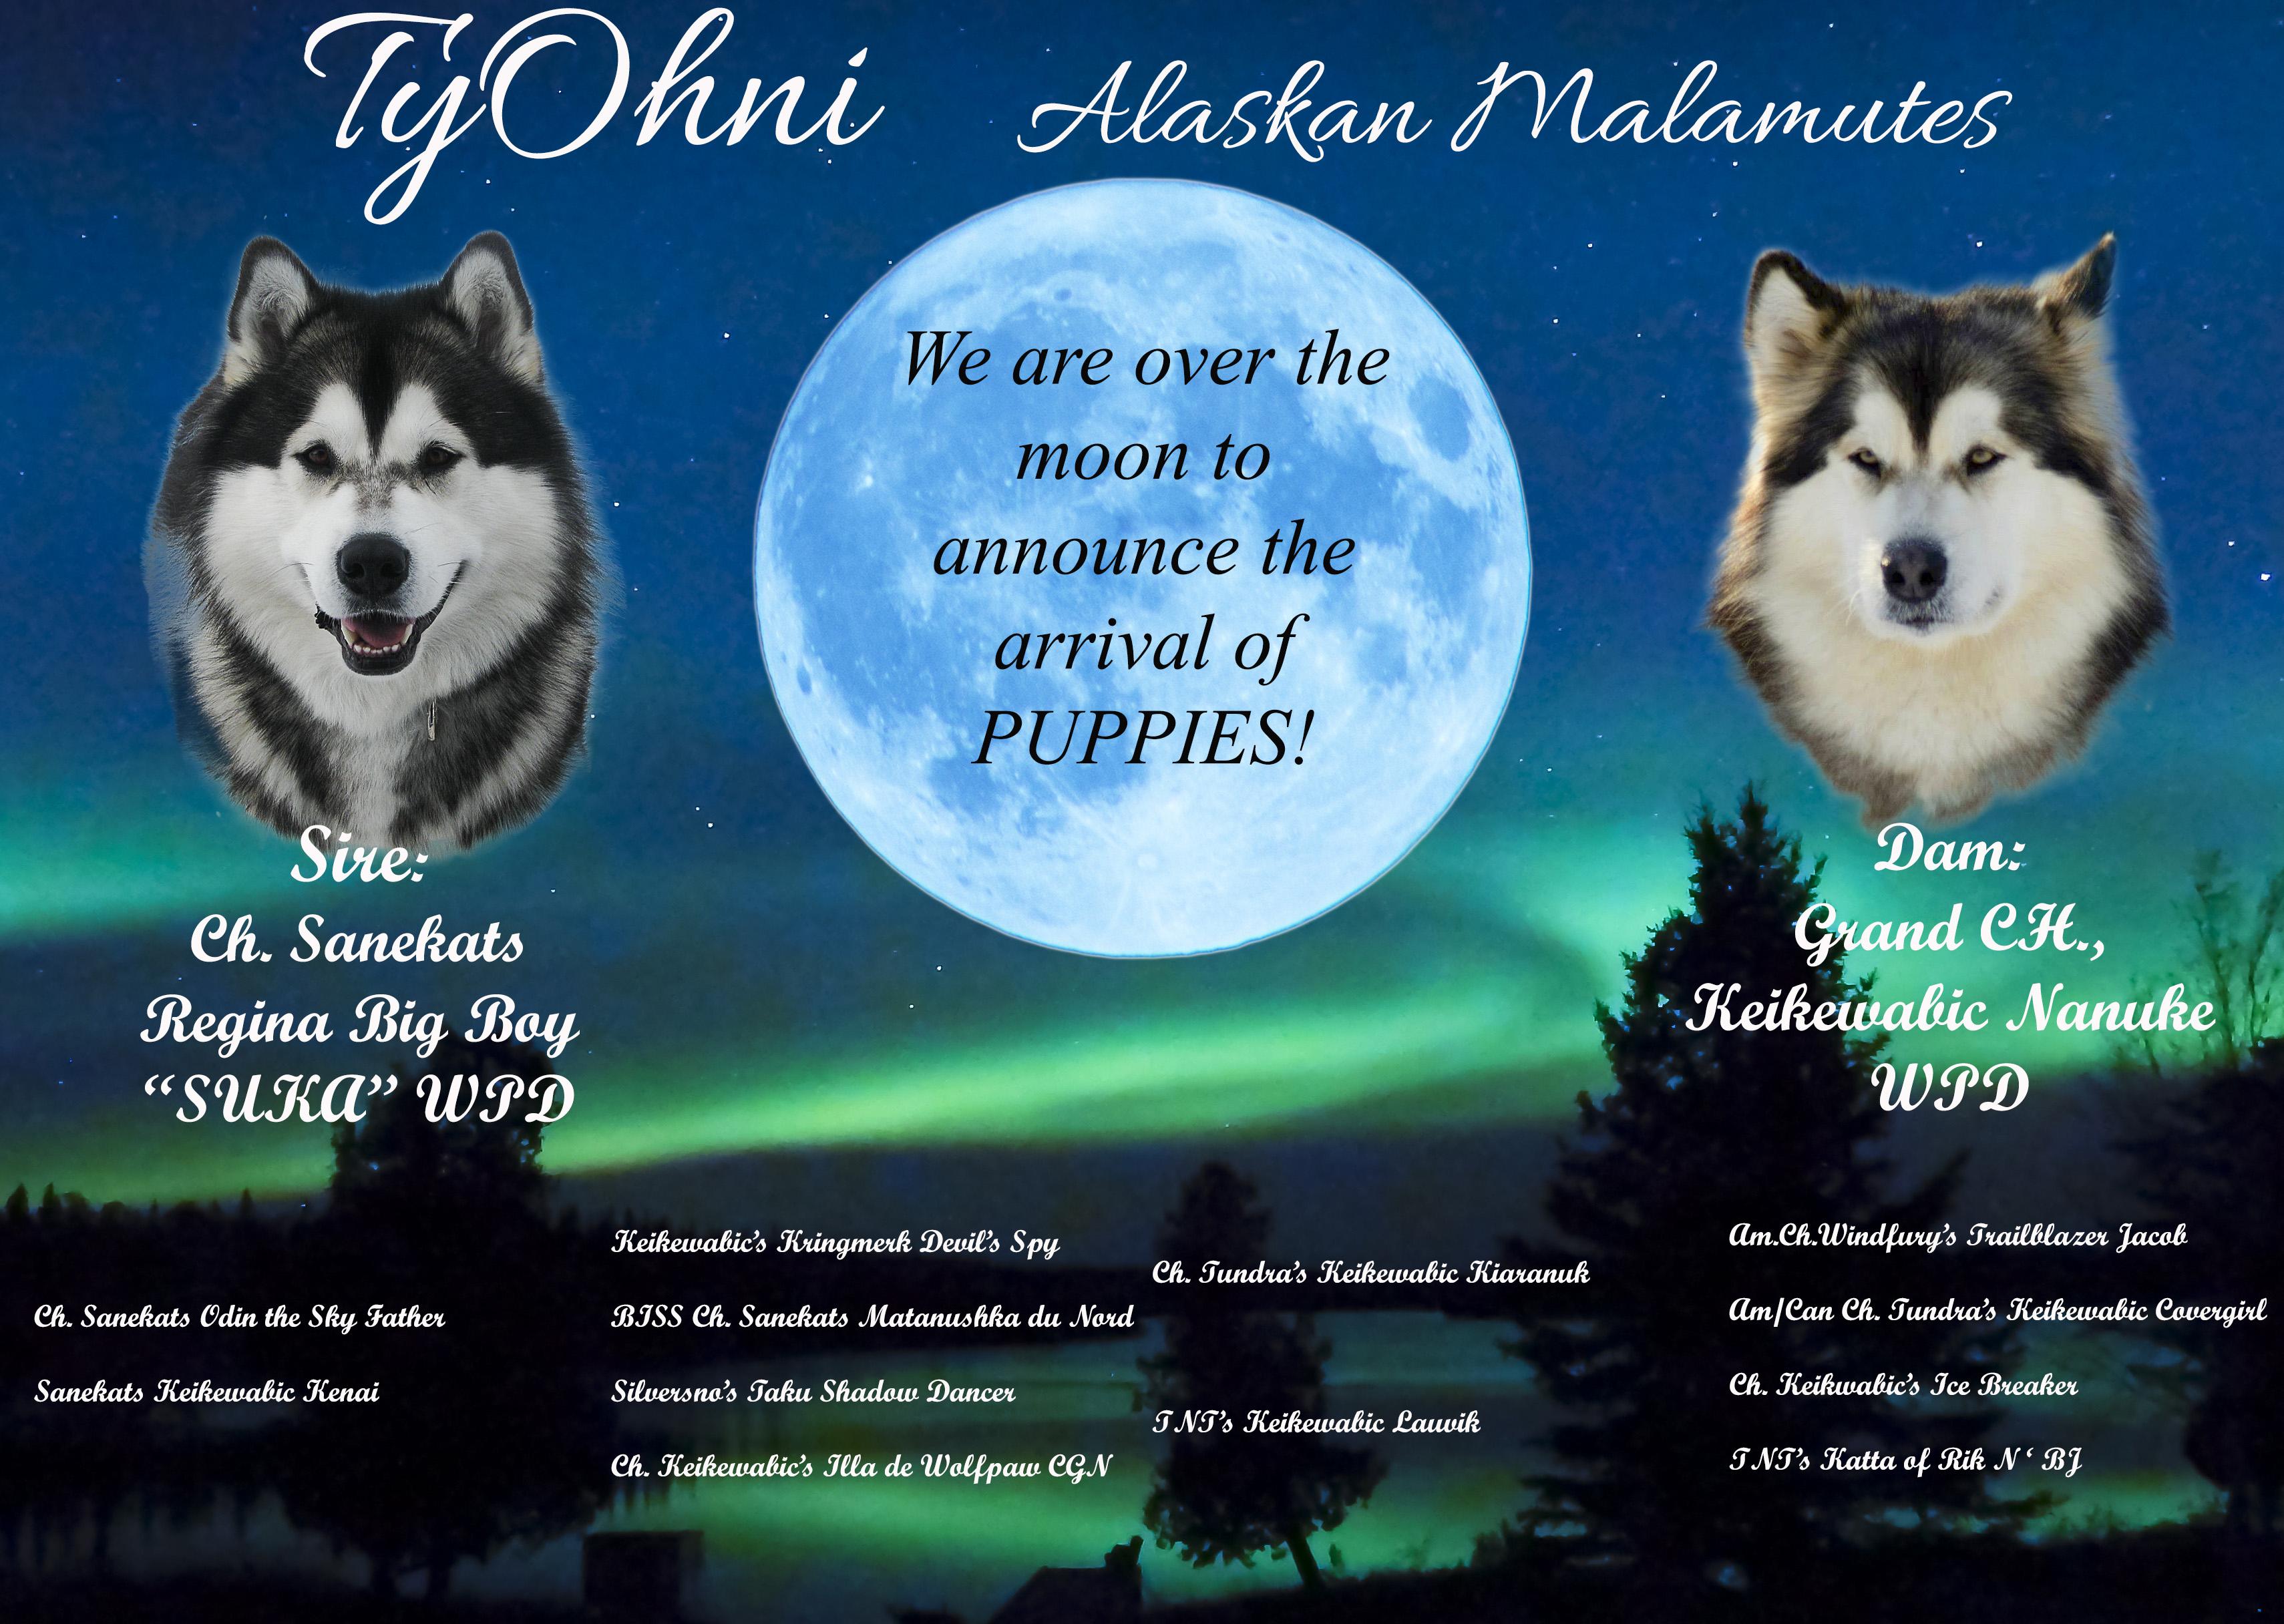 Suka and Nanuke puppies 2018